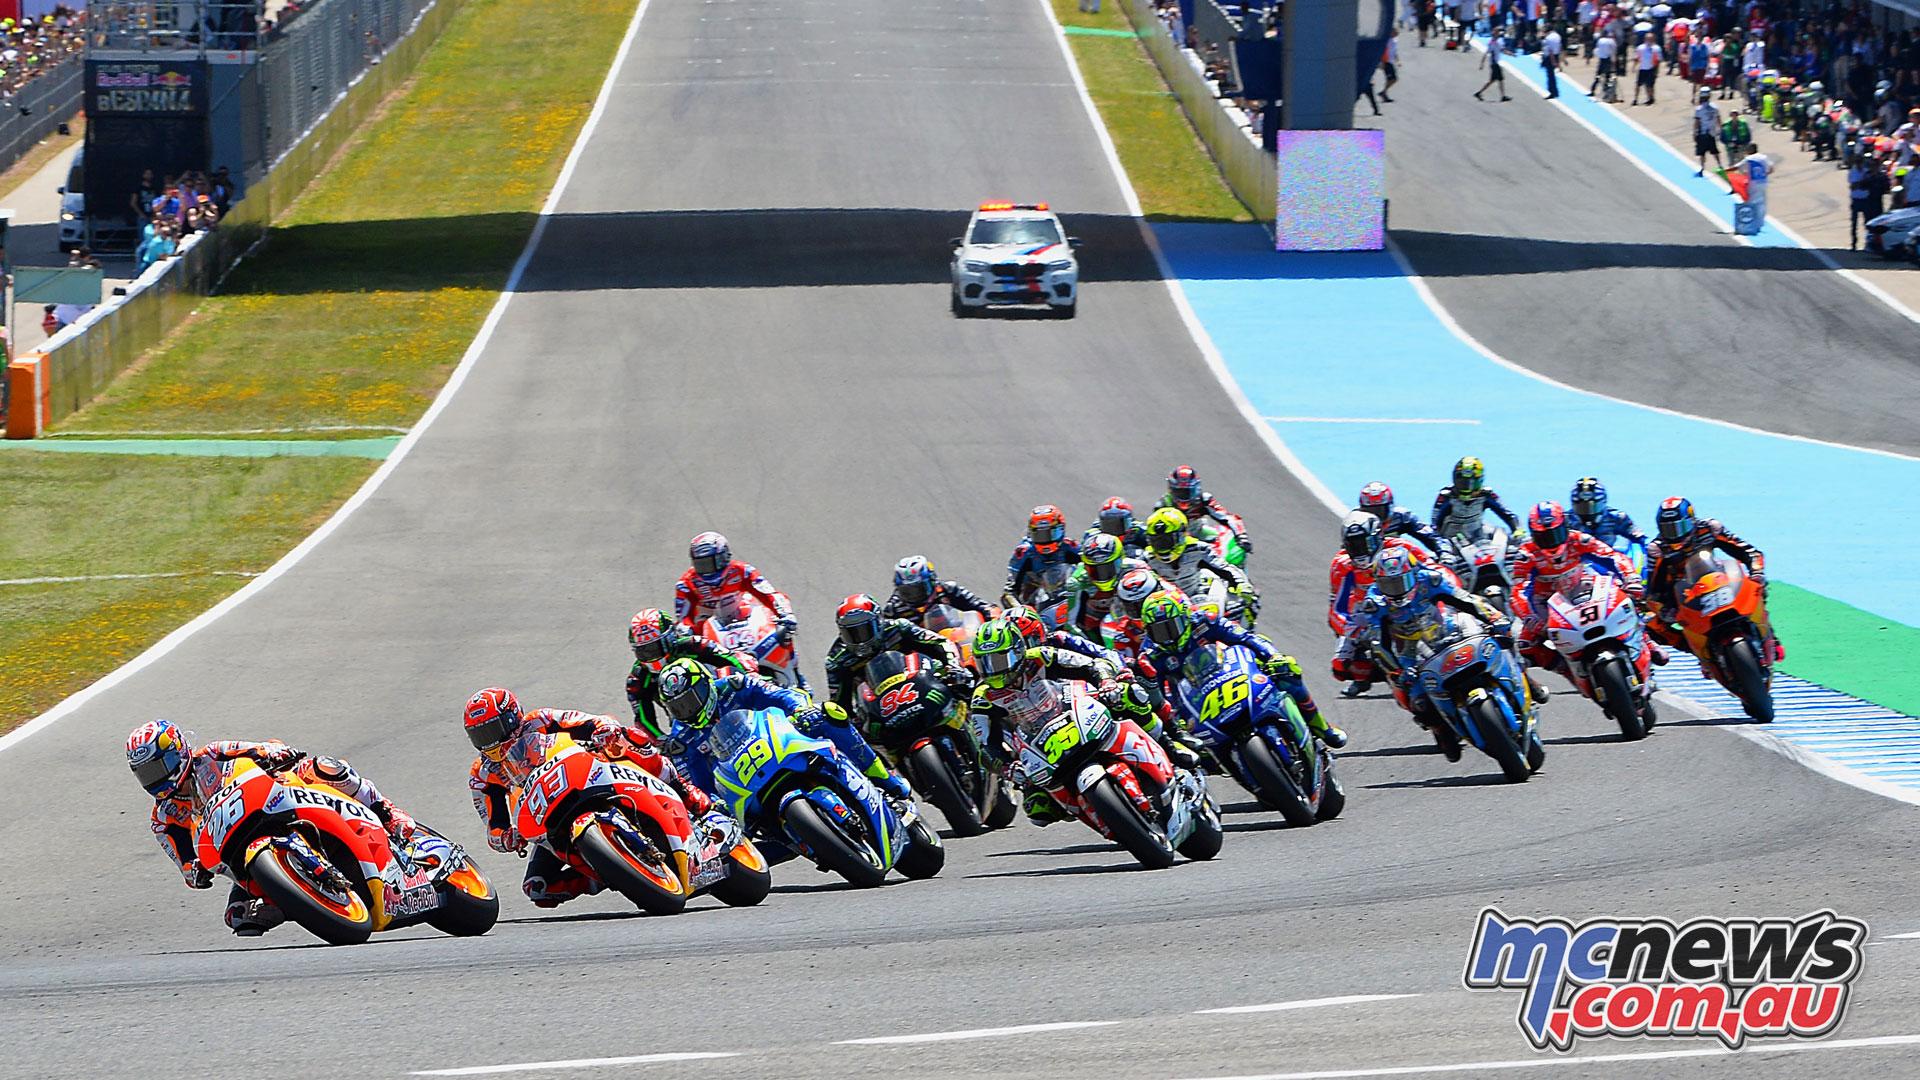 Circuito Jerez : Motogp heads to circuito de jerez angel nieto mcnews